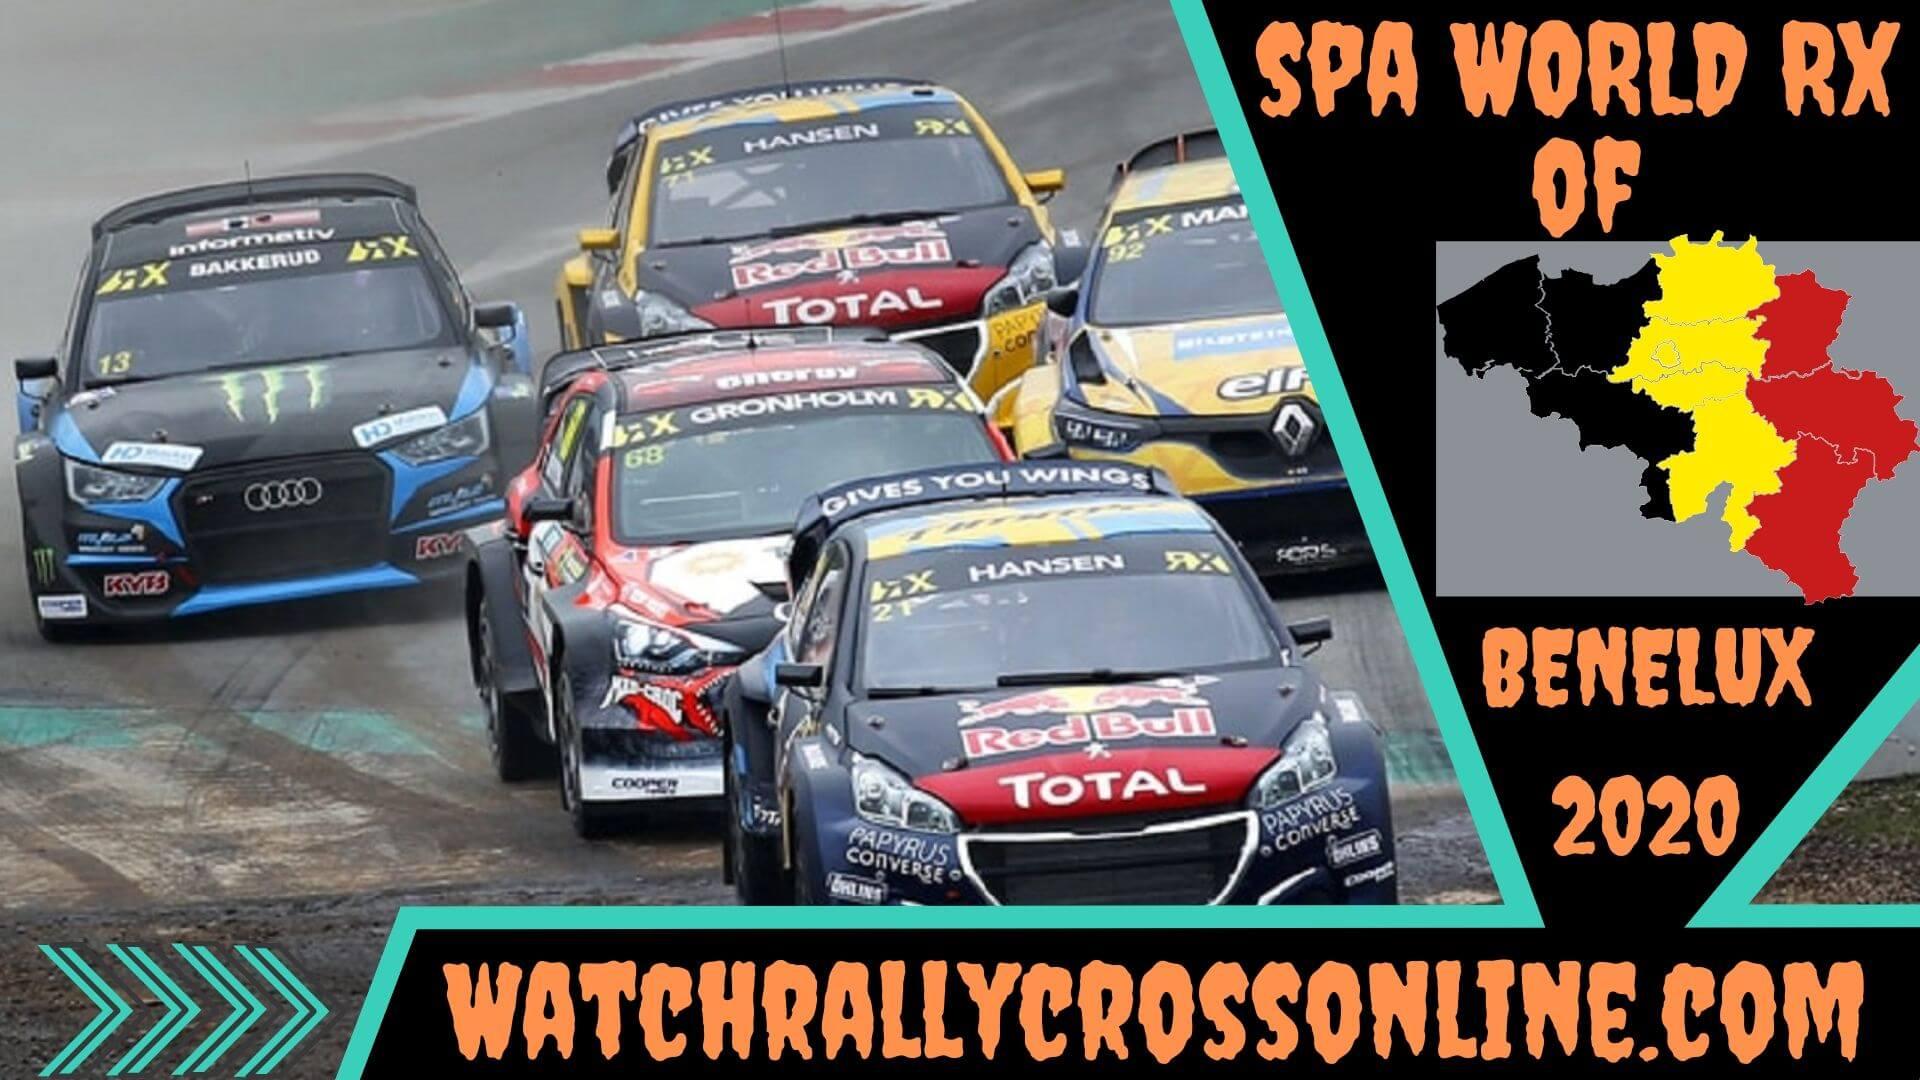 Spa World Rallycross of Benelux Live Stream 2020 | Round 3